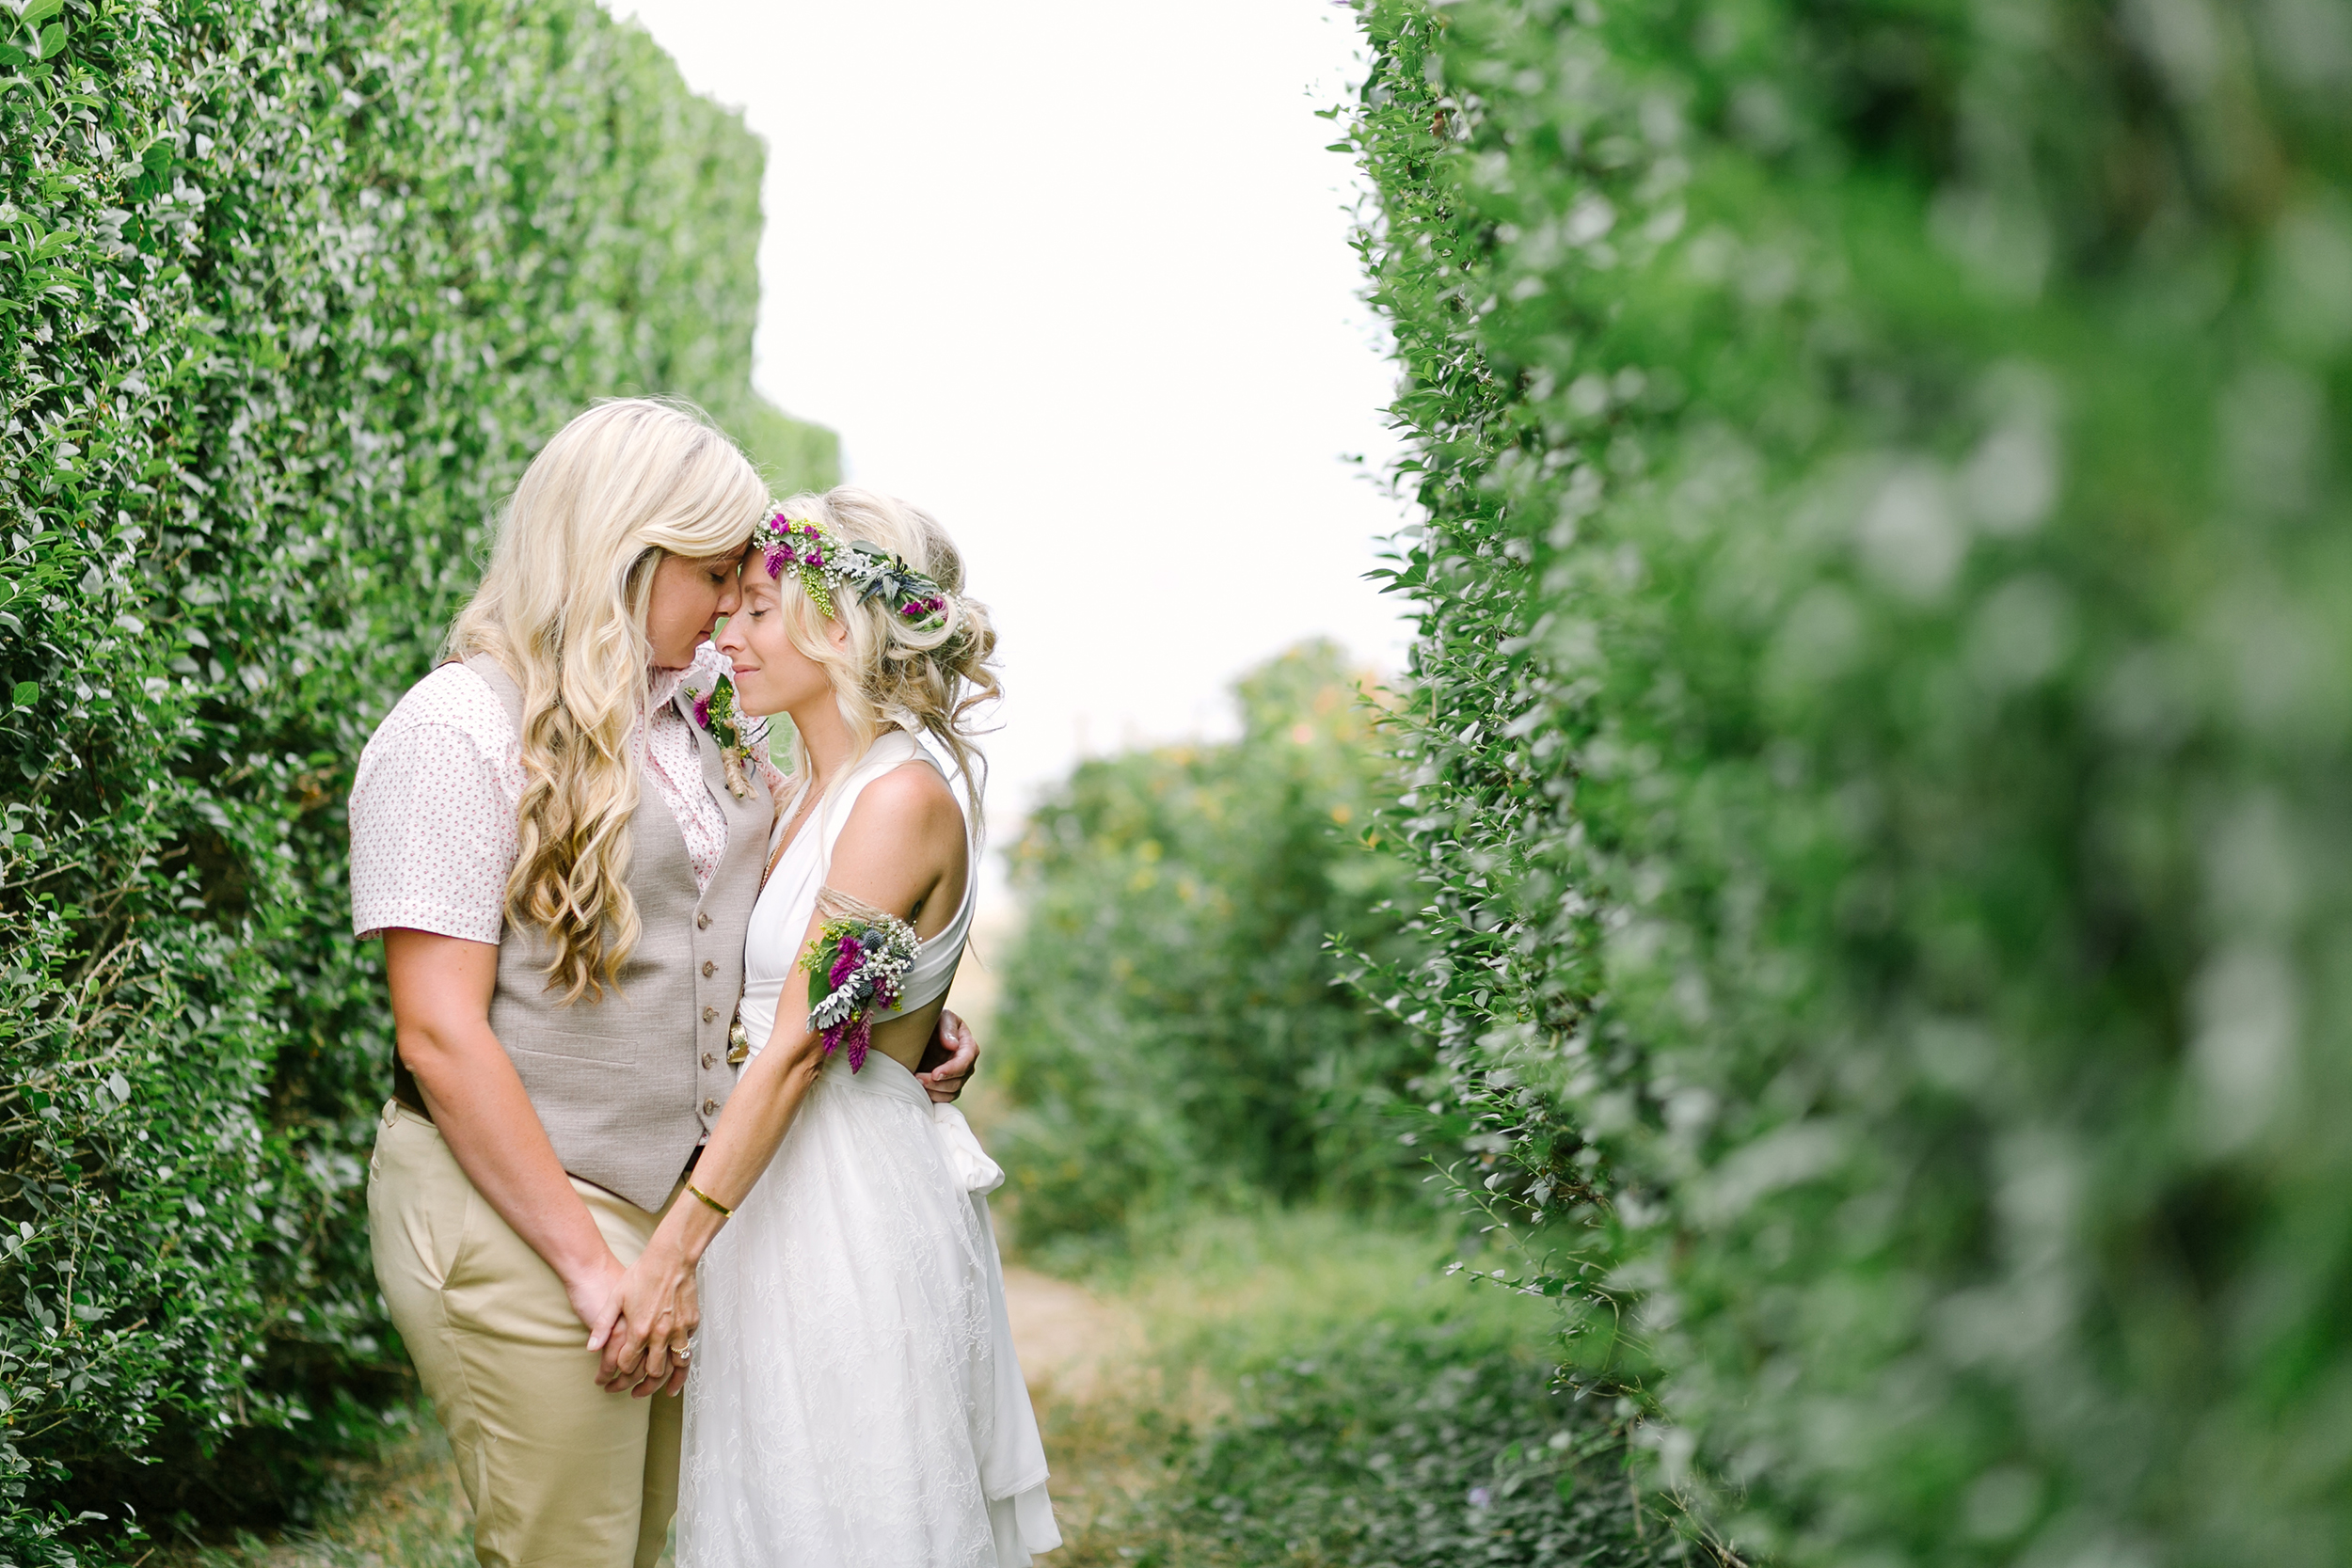 Austin_Wedding_Photographer_Kimberly_Brooke_Photographic_153.jpg